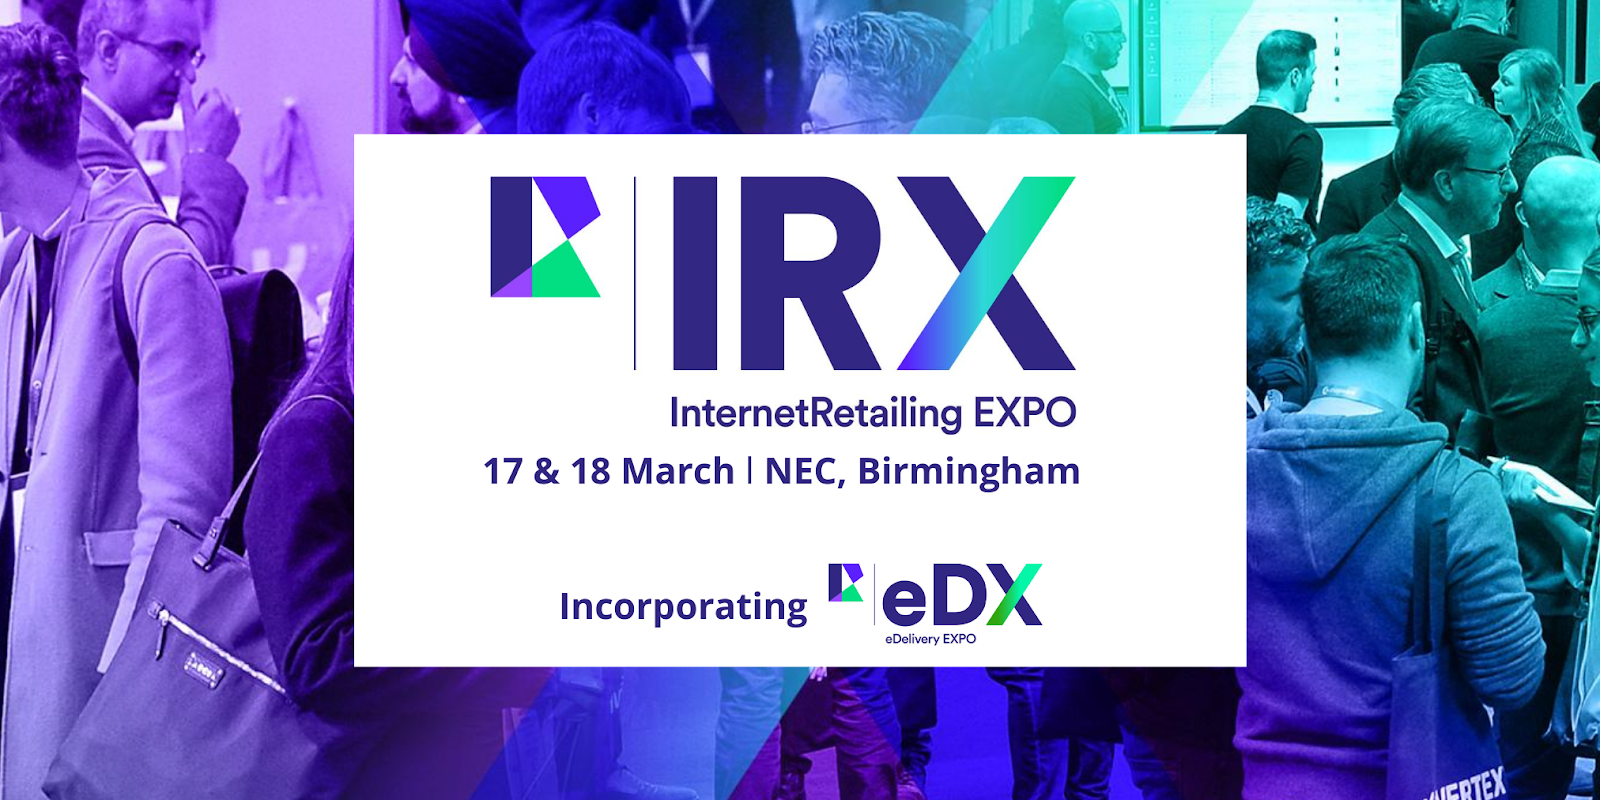 Internet Retailing Expo 2021